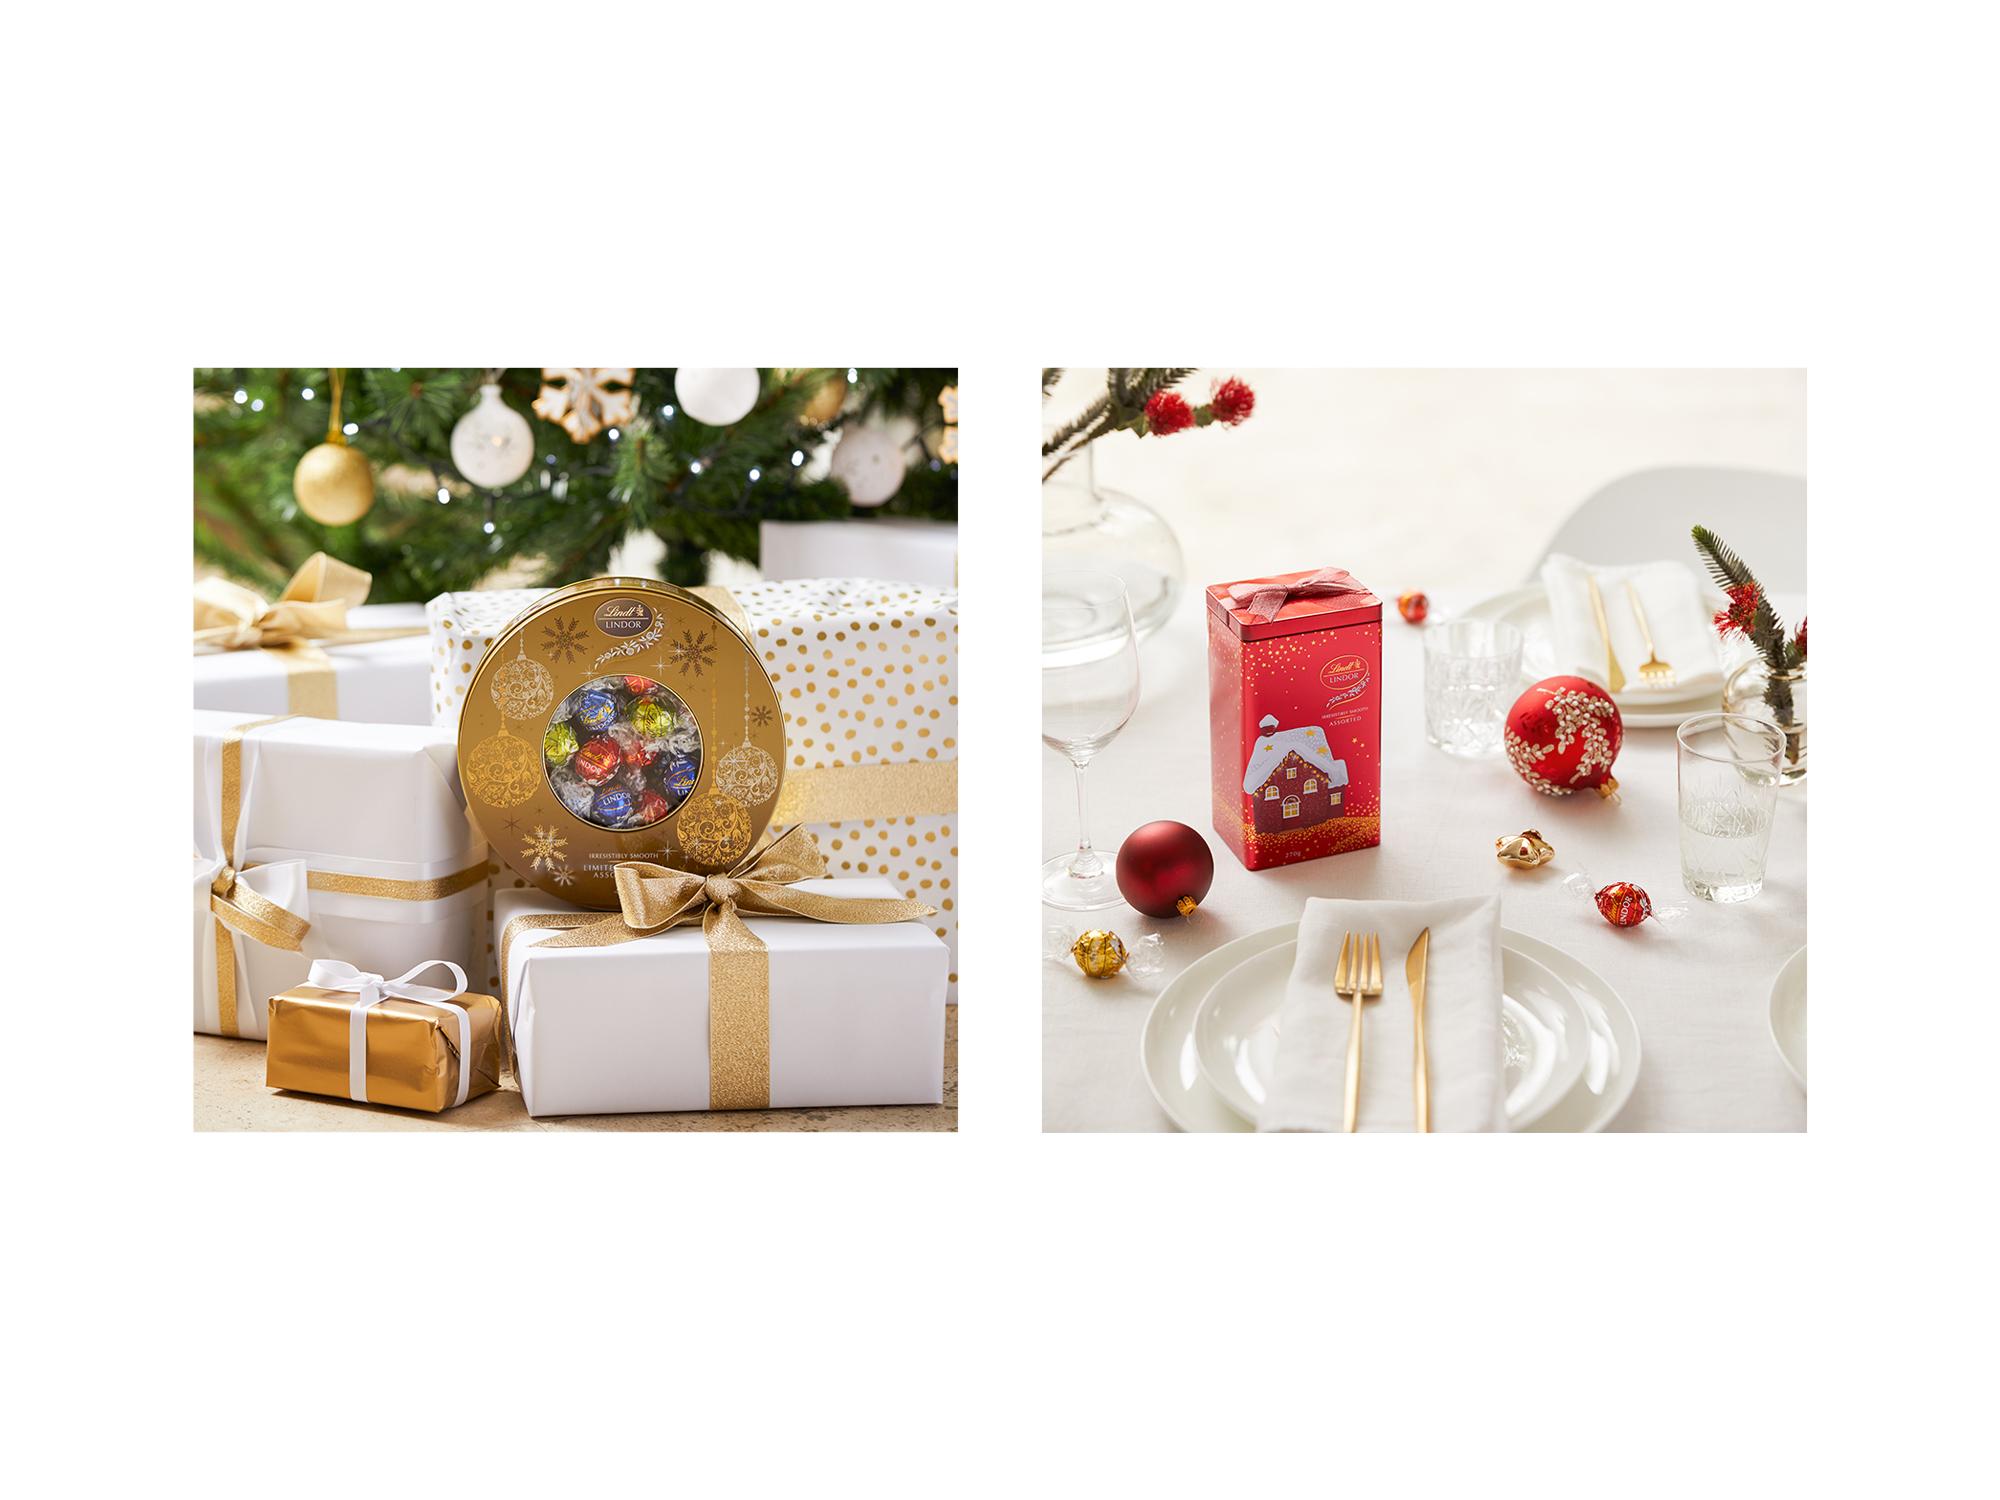 Lindt_Social Christmas Mockups020.jpg